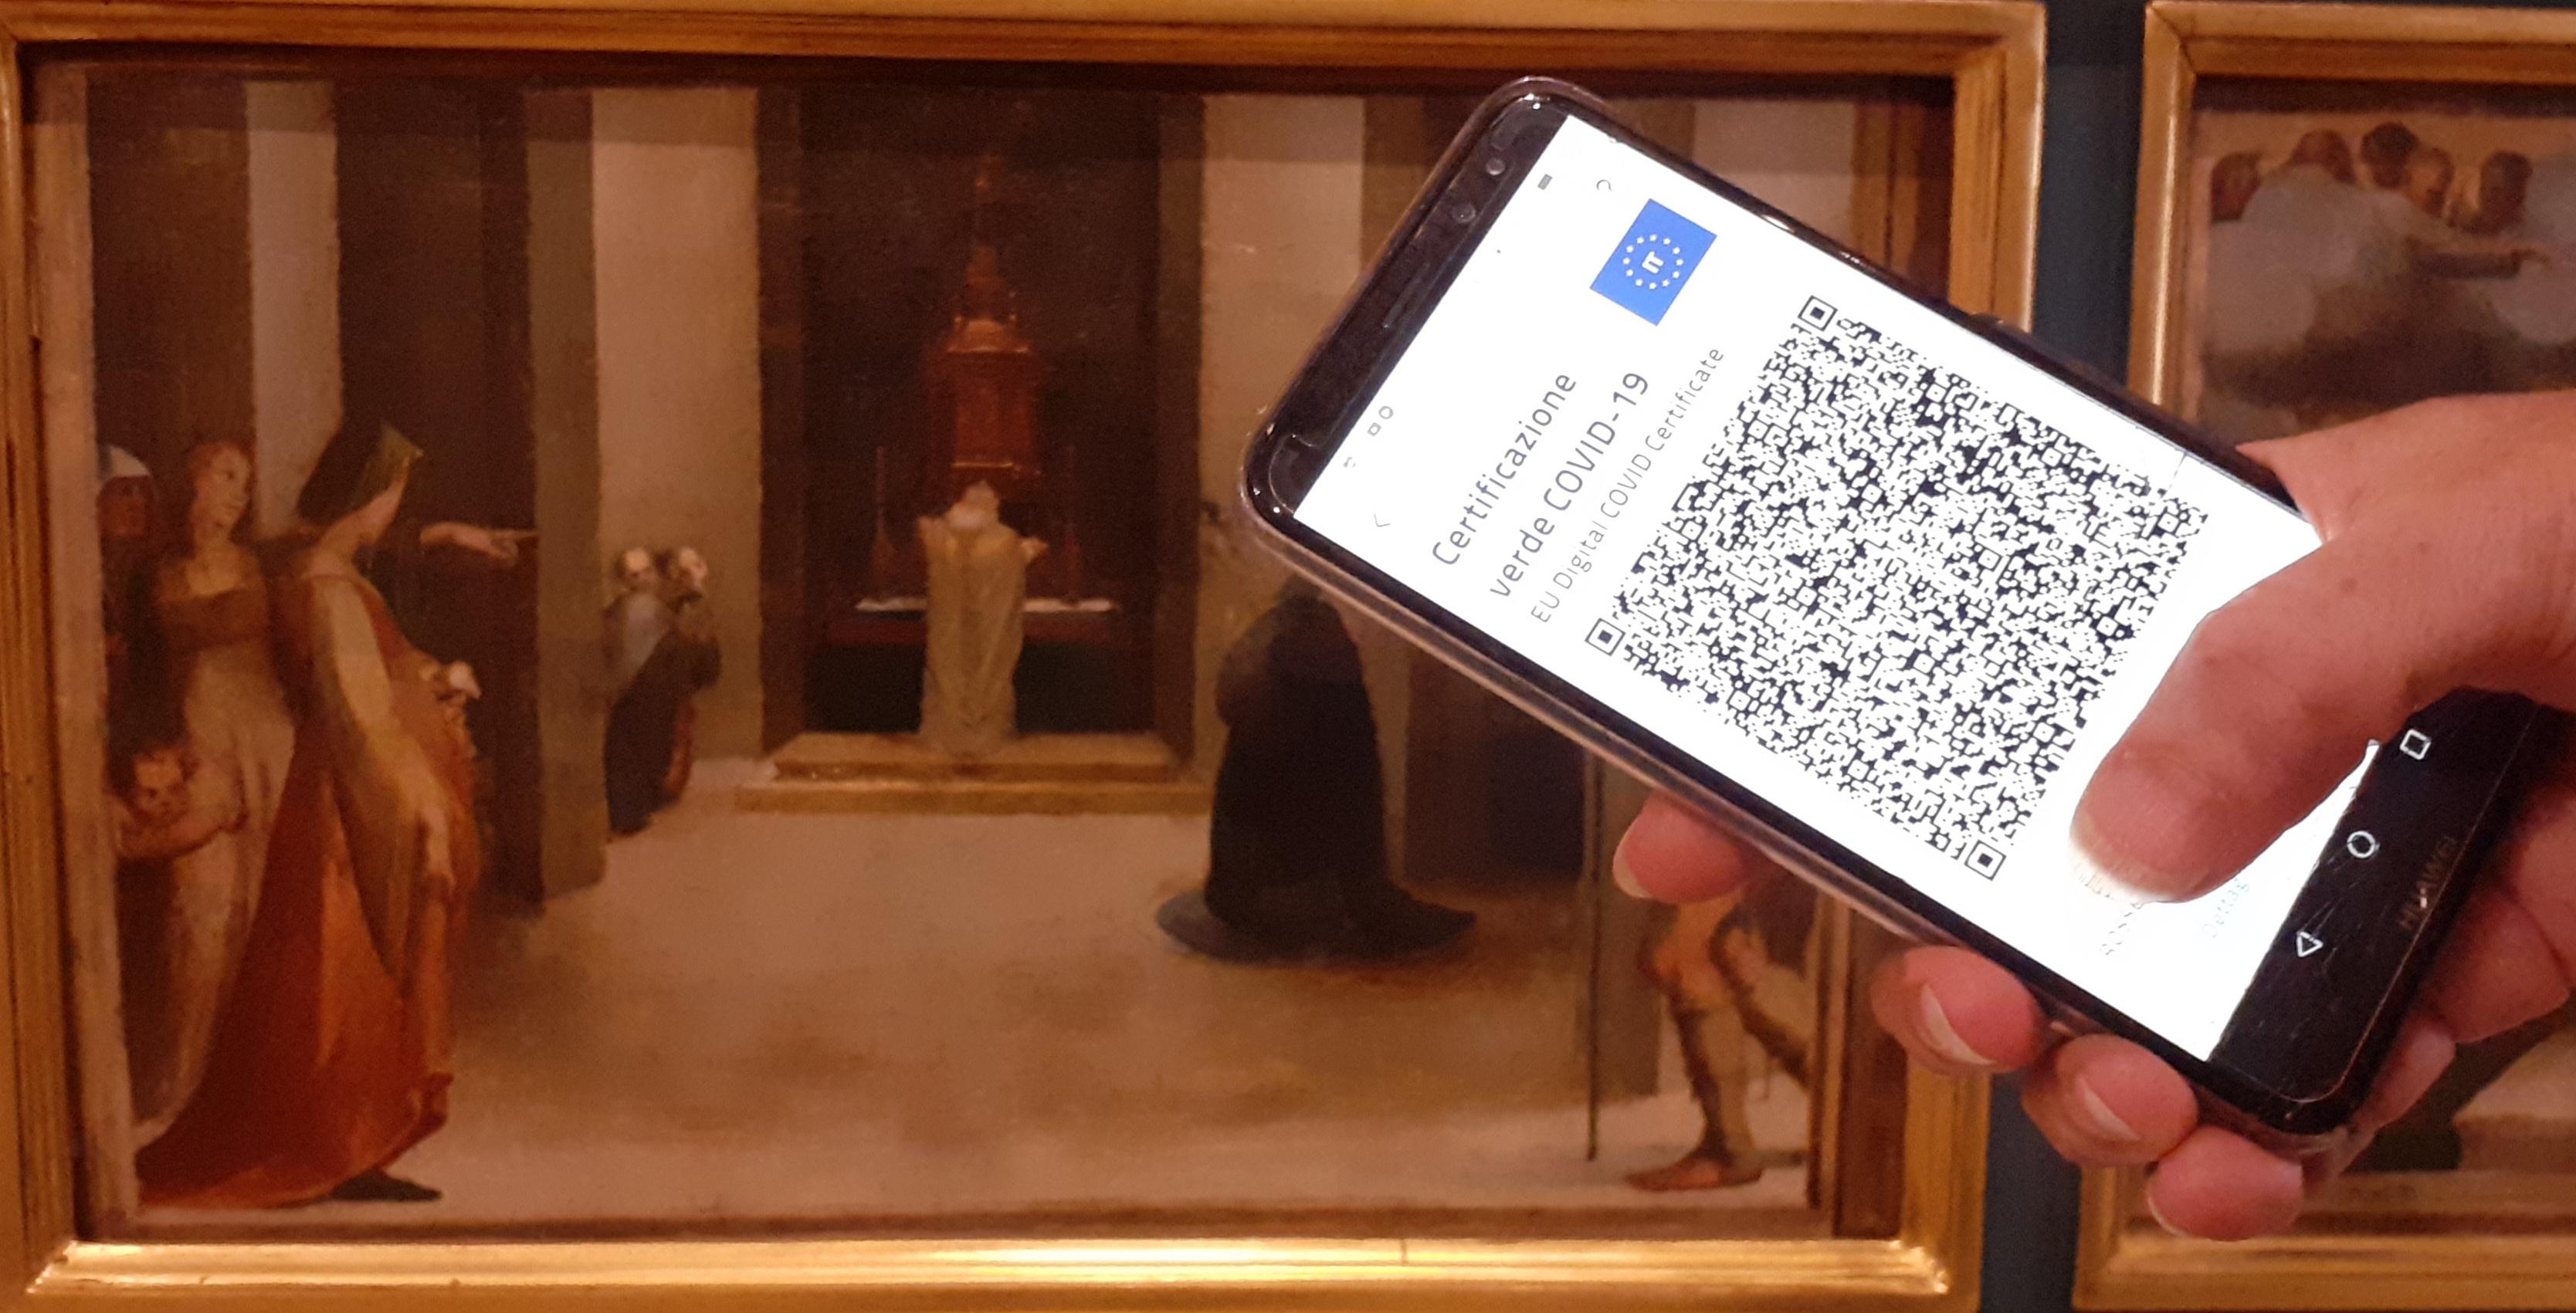 https://pinacotecanazionale.siena.it/wp-content/uploads/20210805_151153.jpg